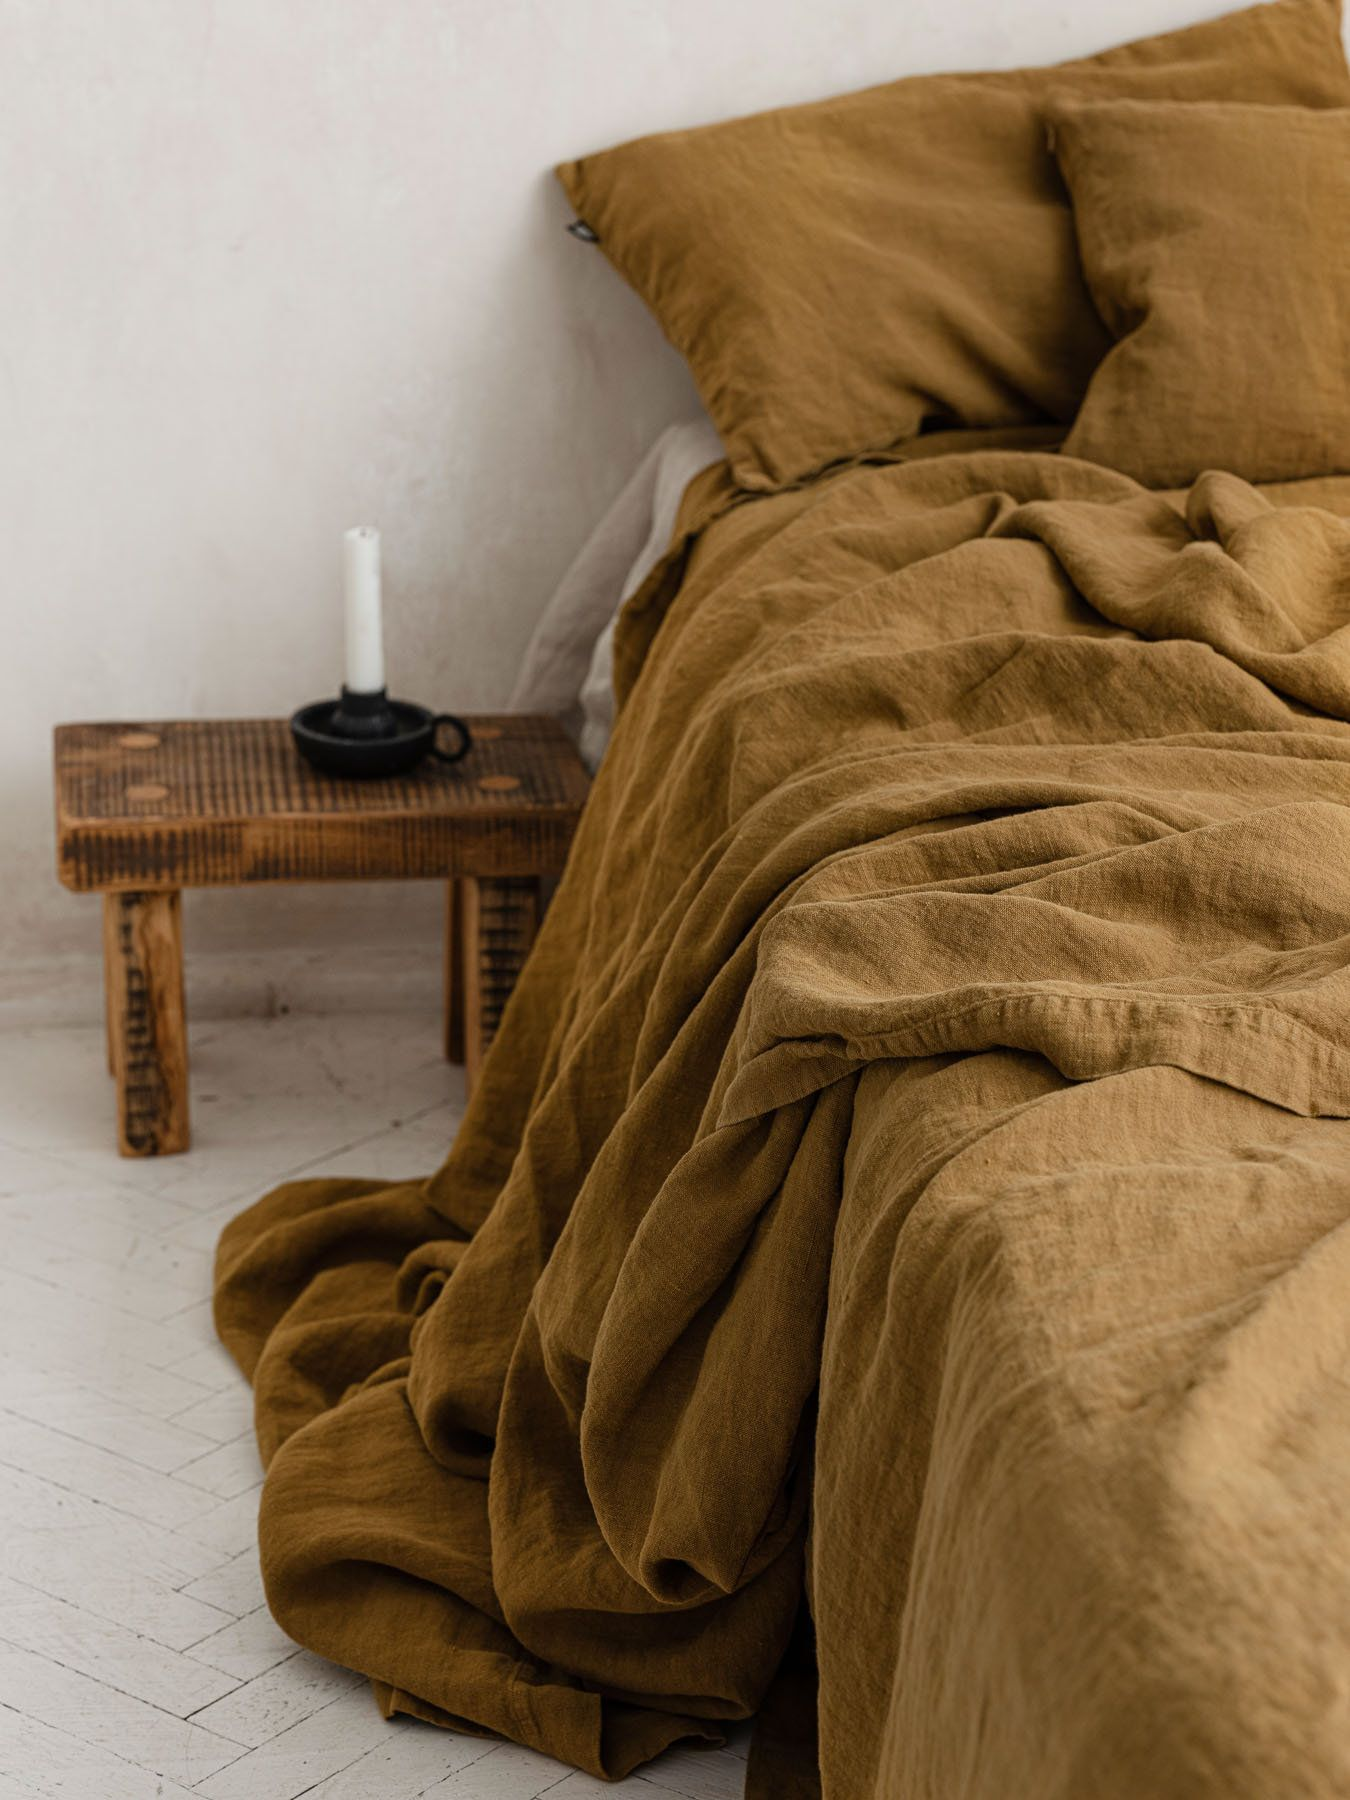 Mustard Linen Bedspread Honey Linen Bed Cover Solid Golden Etsy Linen Bed Cover Linen Bedspread Bed Spreads